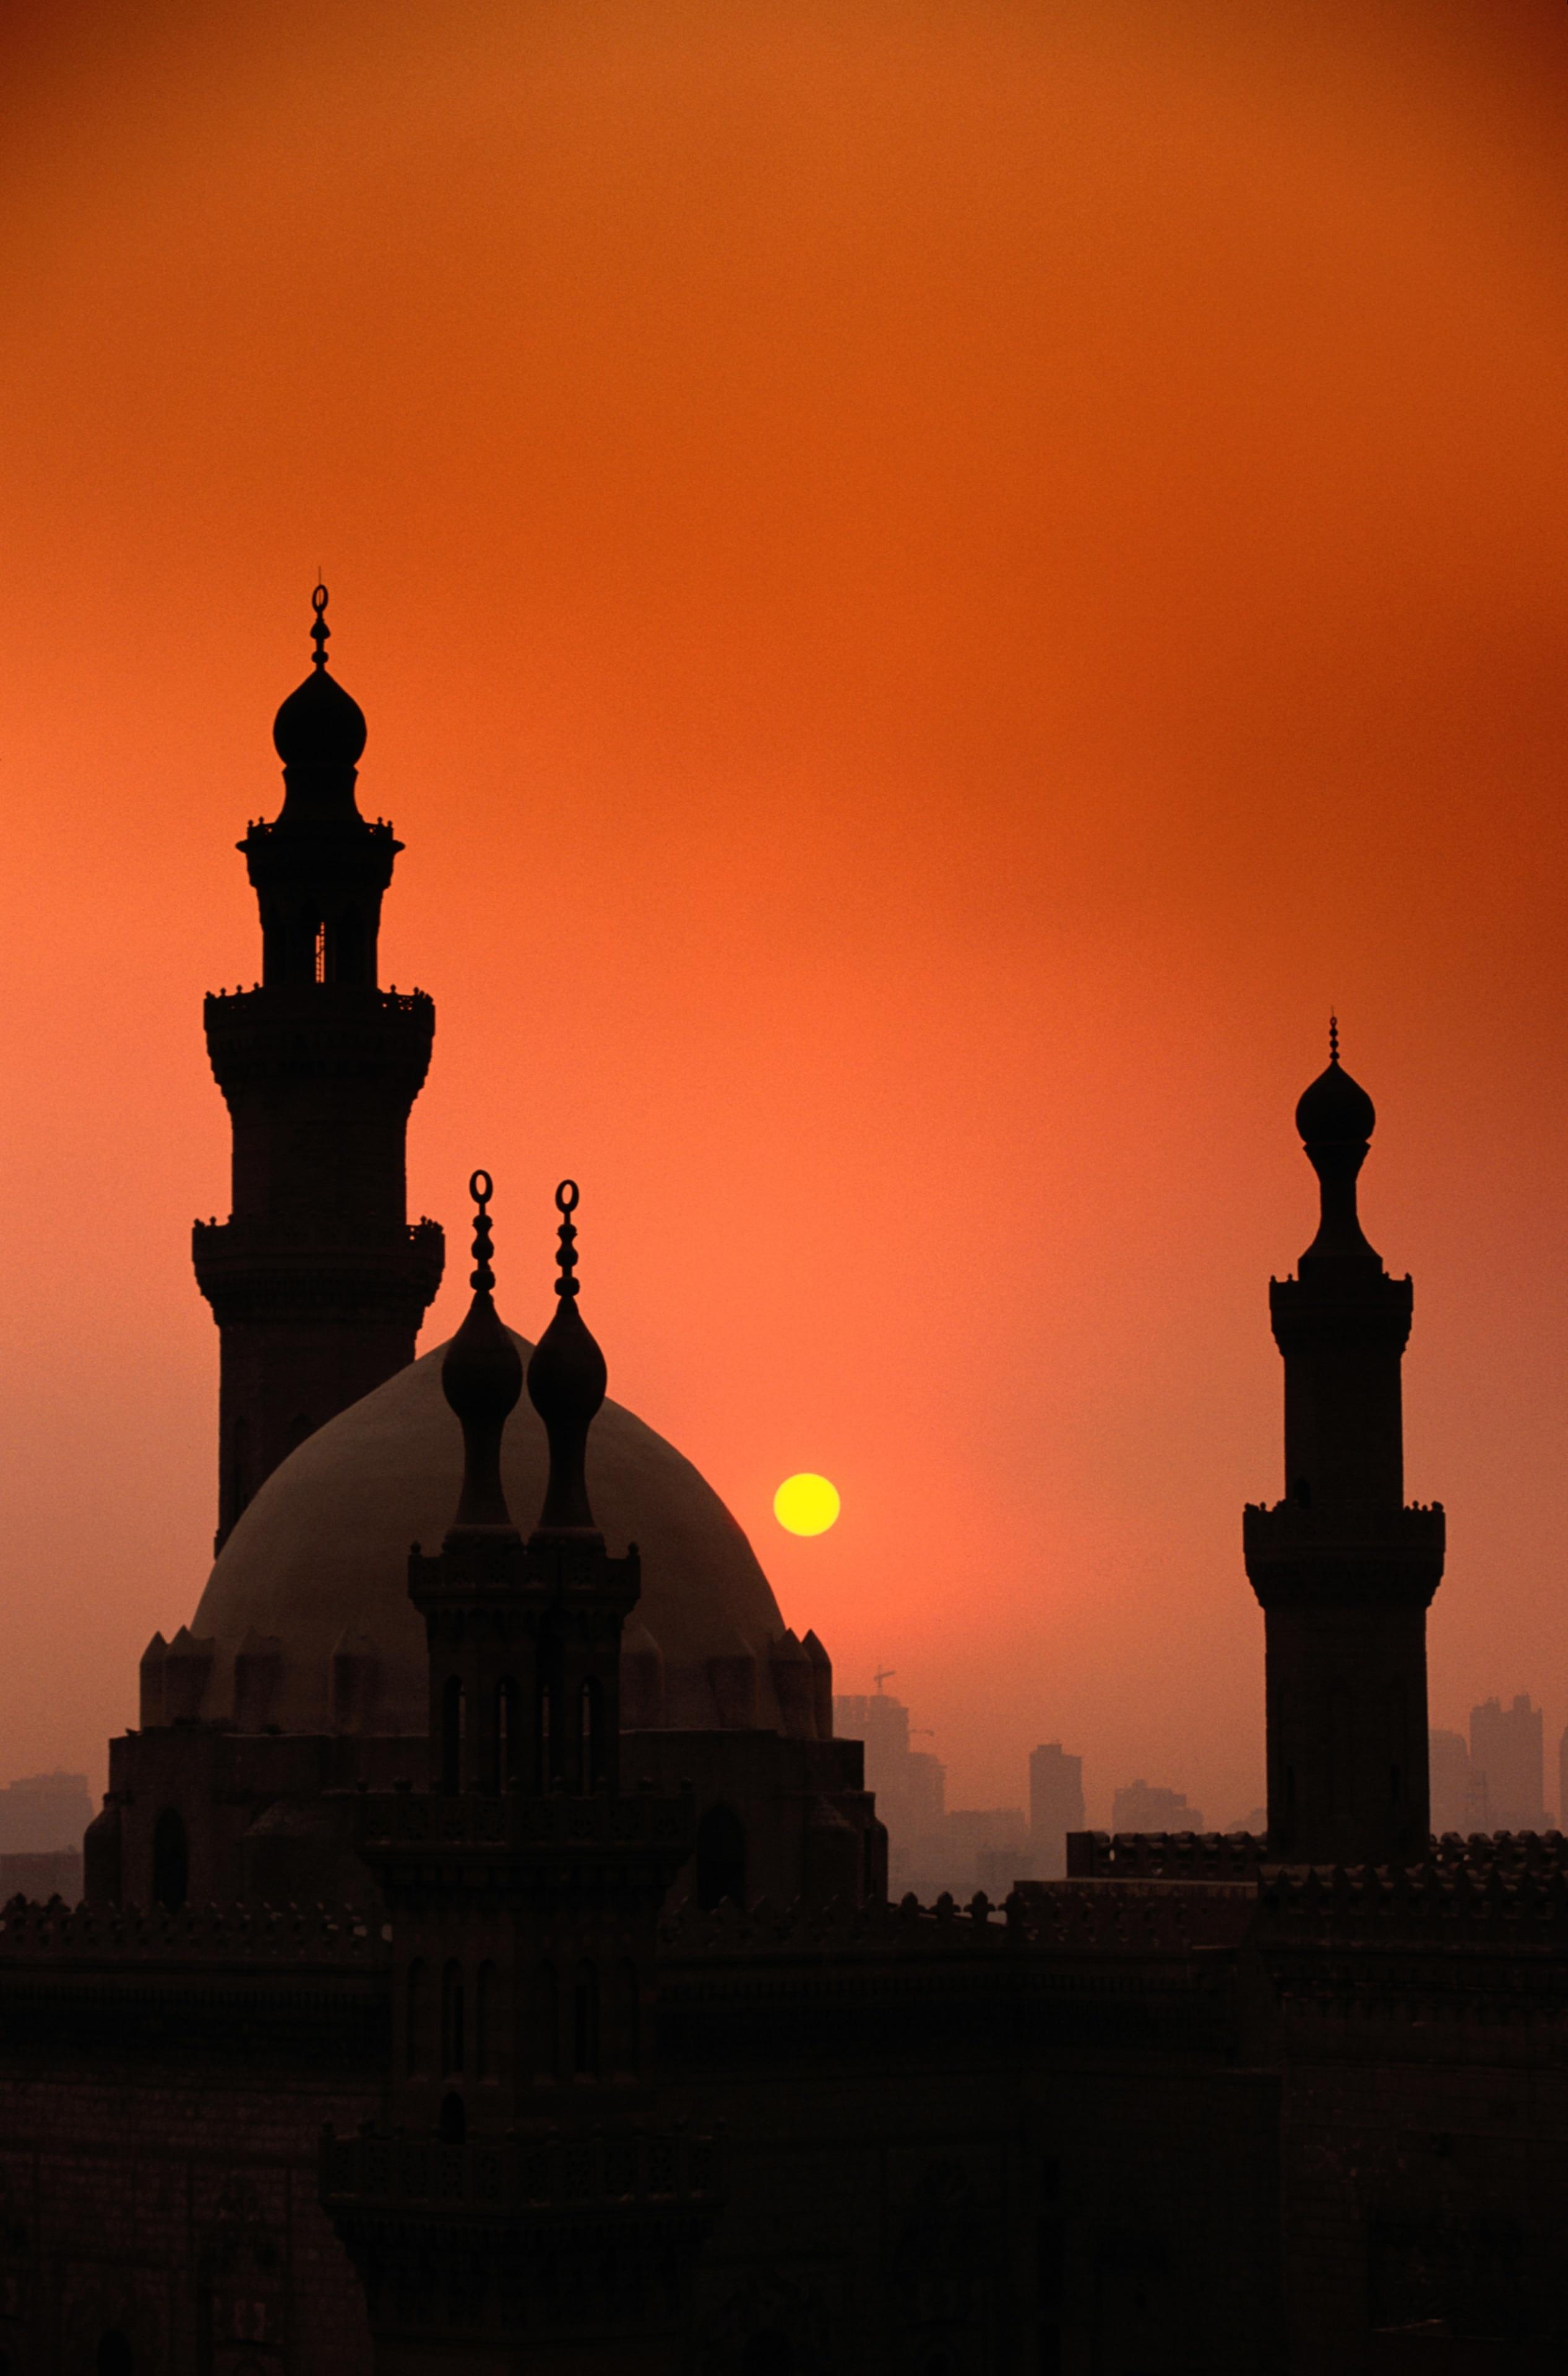 Al-Azhar Park, Cairo, Cairo Governorate, Egypt